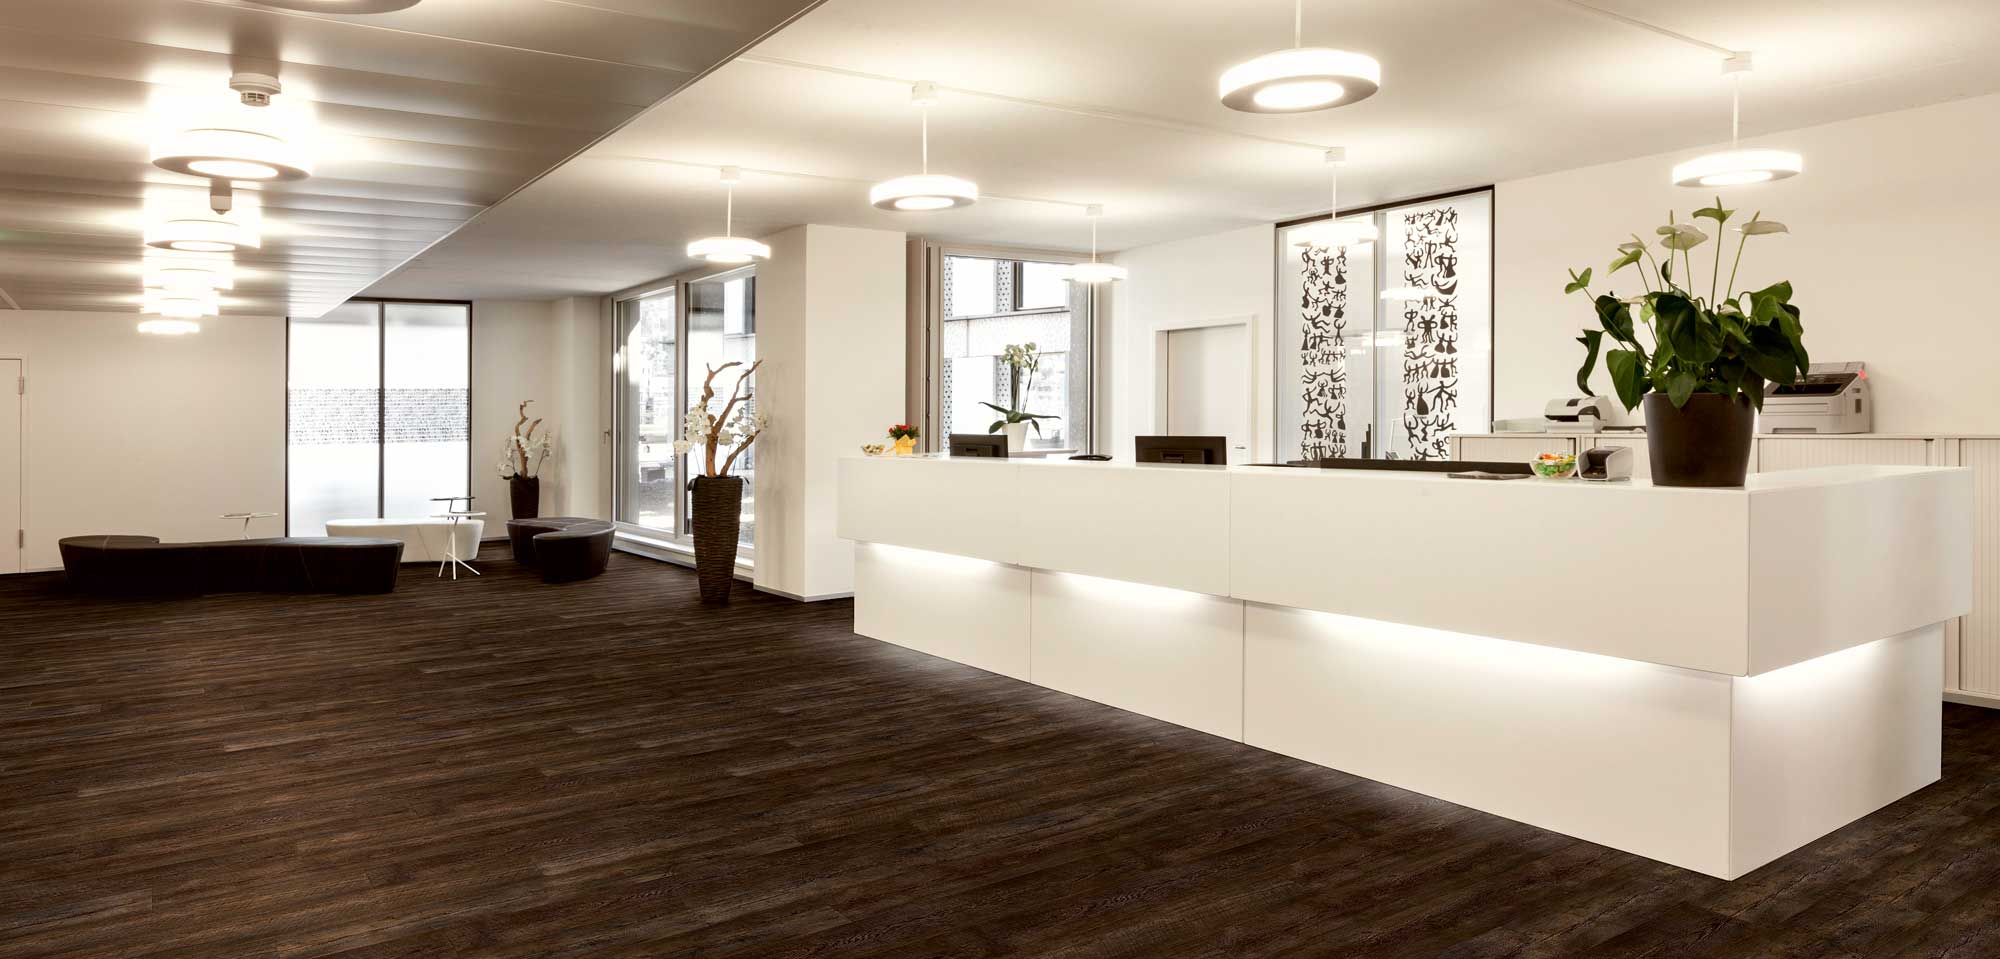 Elemental by Aspecta - PVC Vloeren - Het Parkethuis